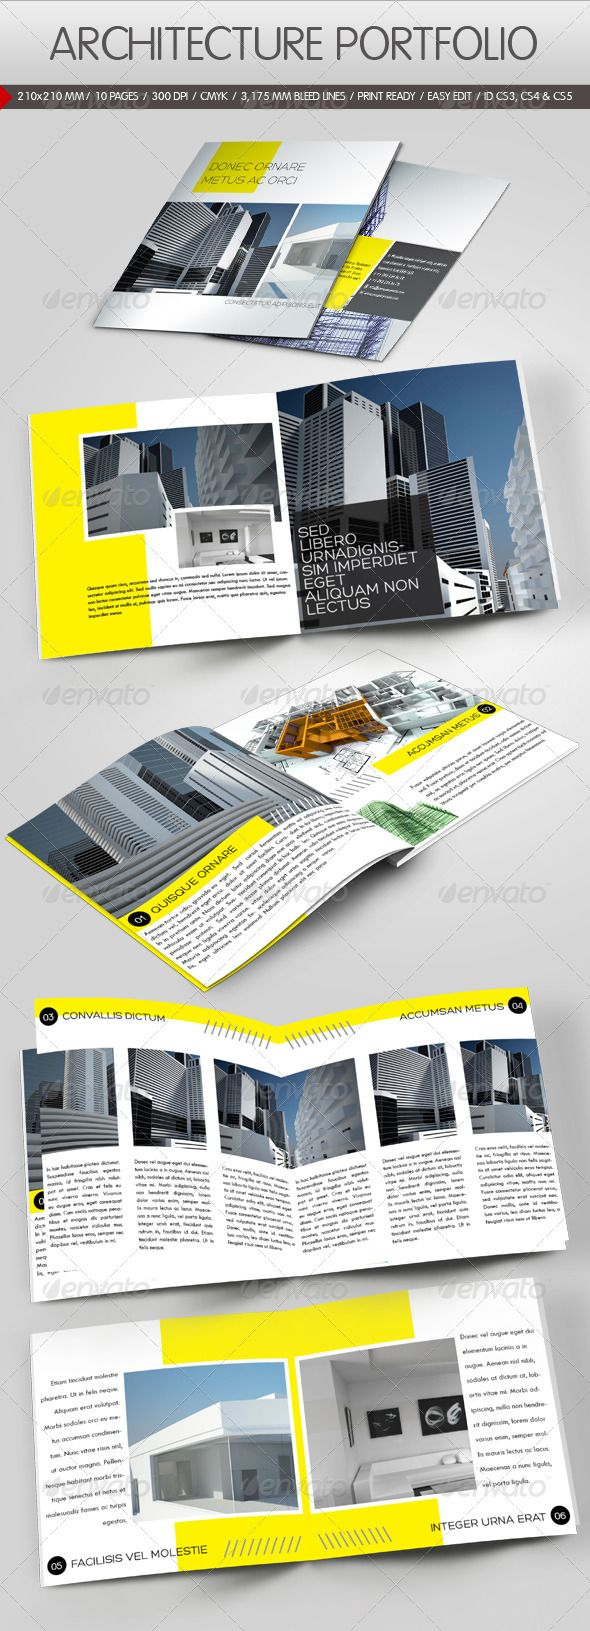 Construction Company Brochure Design Corporate Brochures - Construction brochure templates